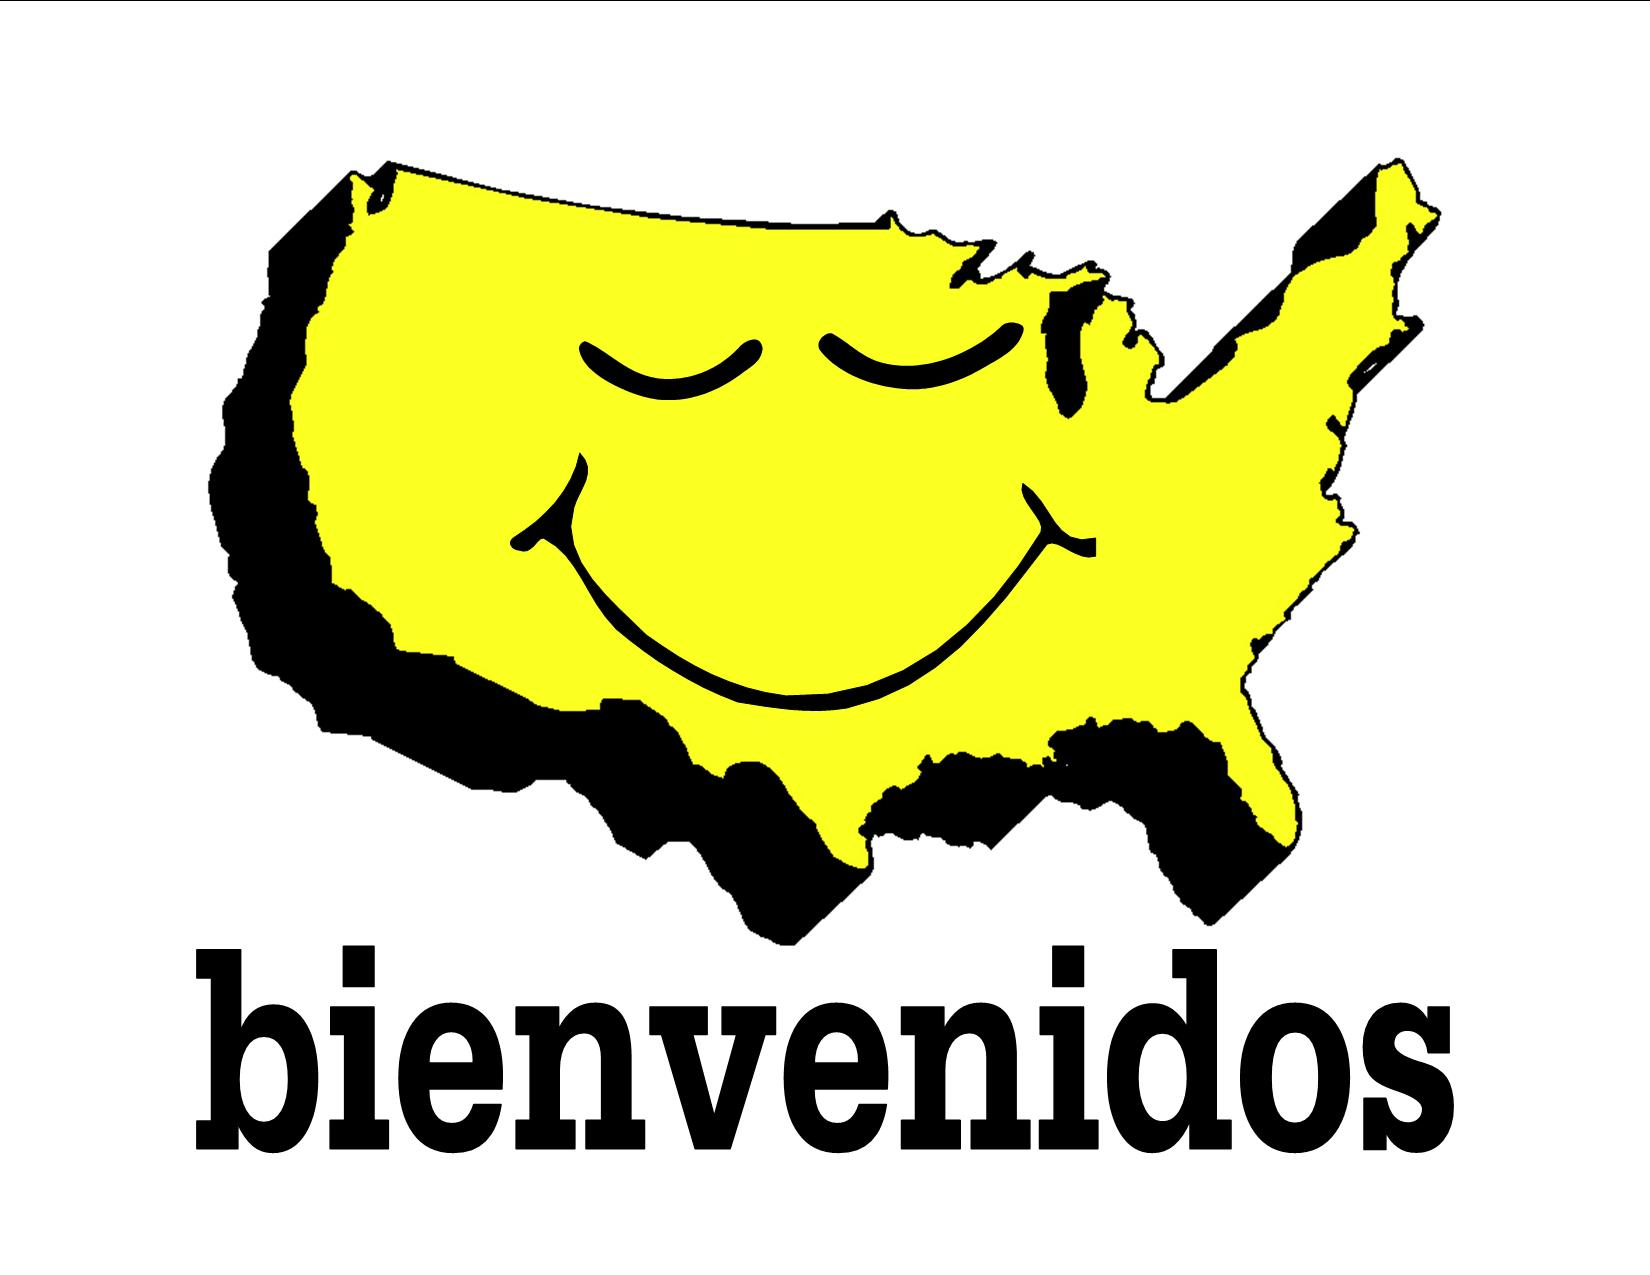 immigration tees - bienvenidos.jpg